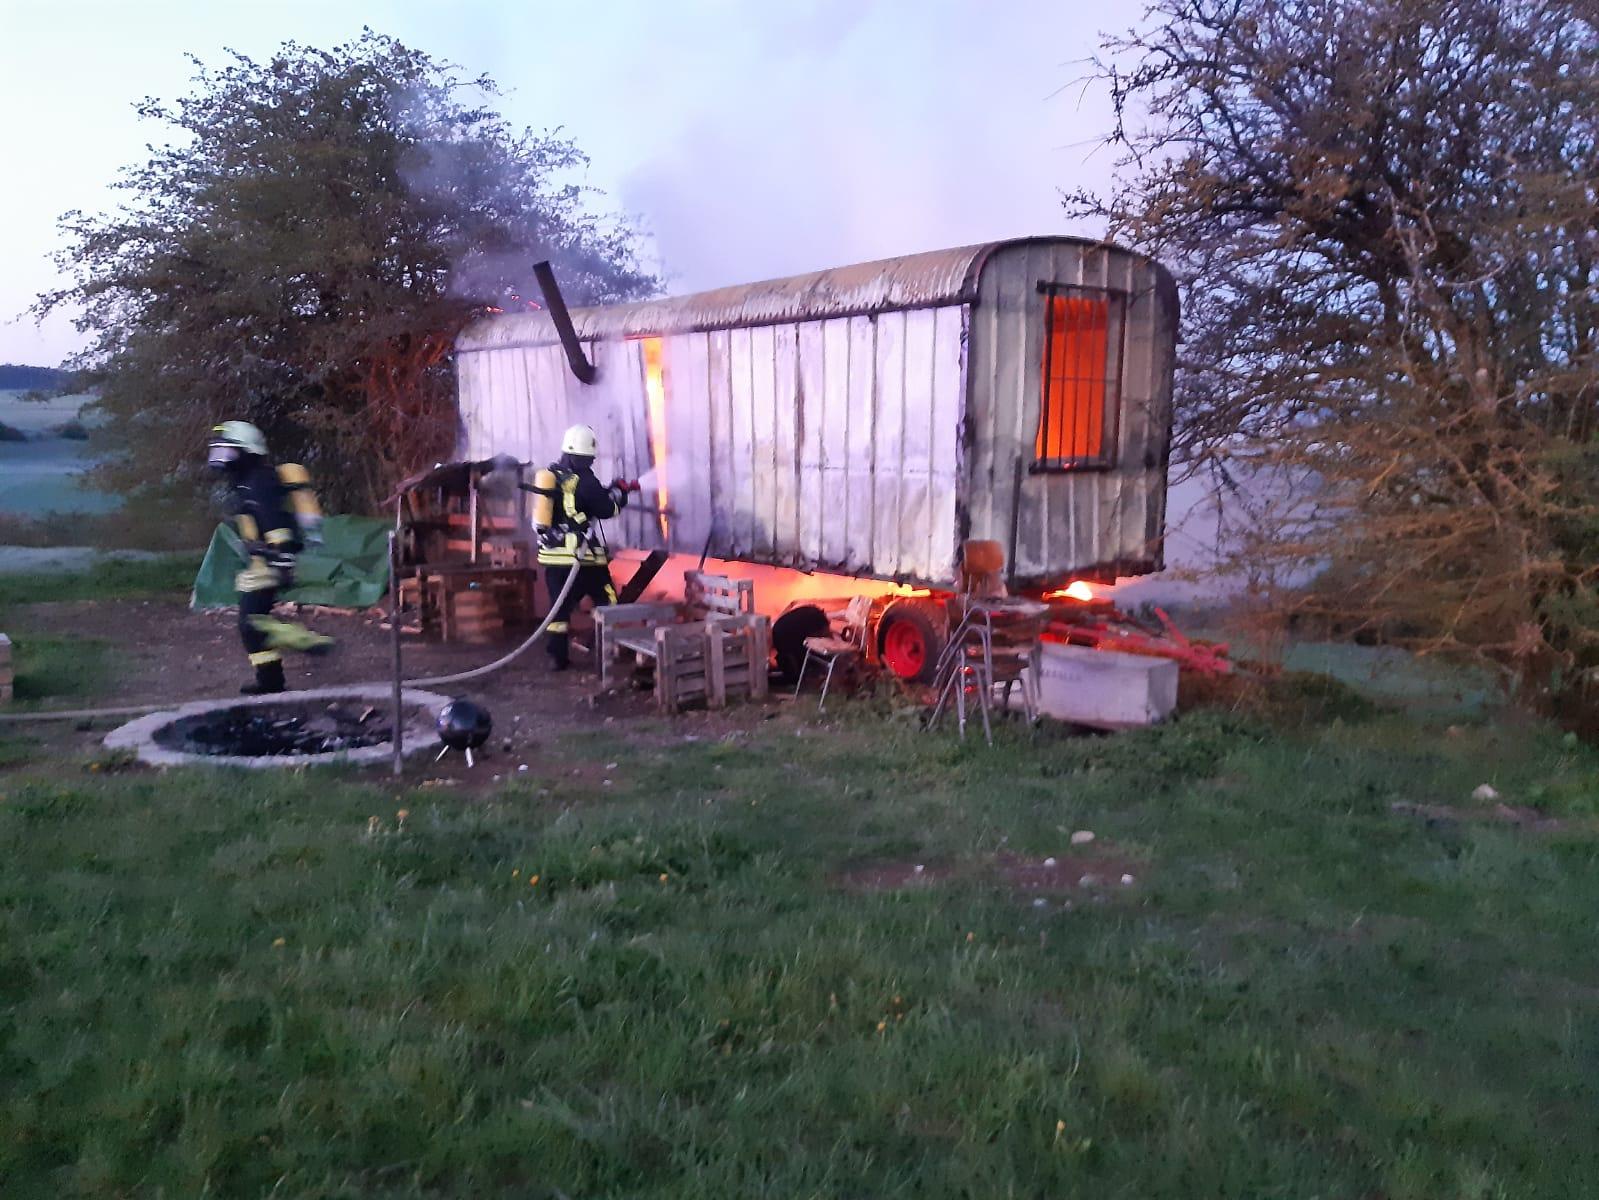 Feuerwehrleute aus Fluorn-Winzeln löschen den brennenden Bauwagen. Fotos: E. Moosmann